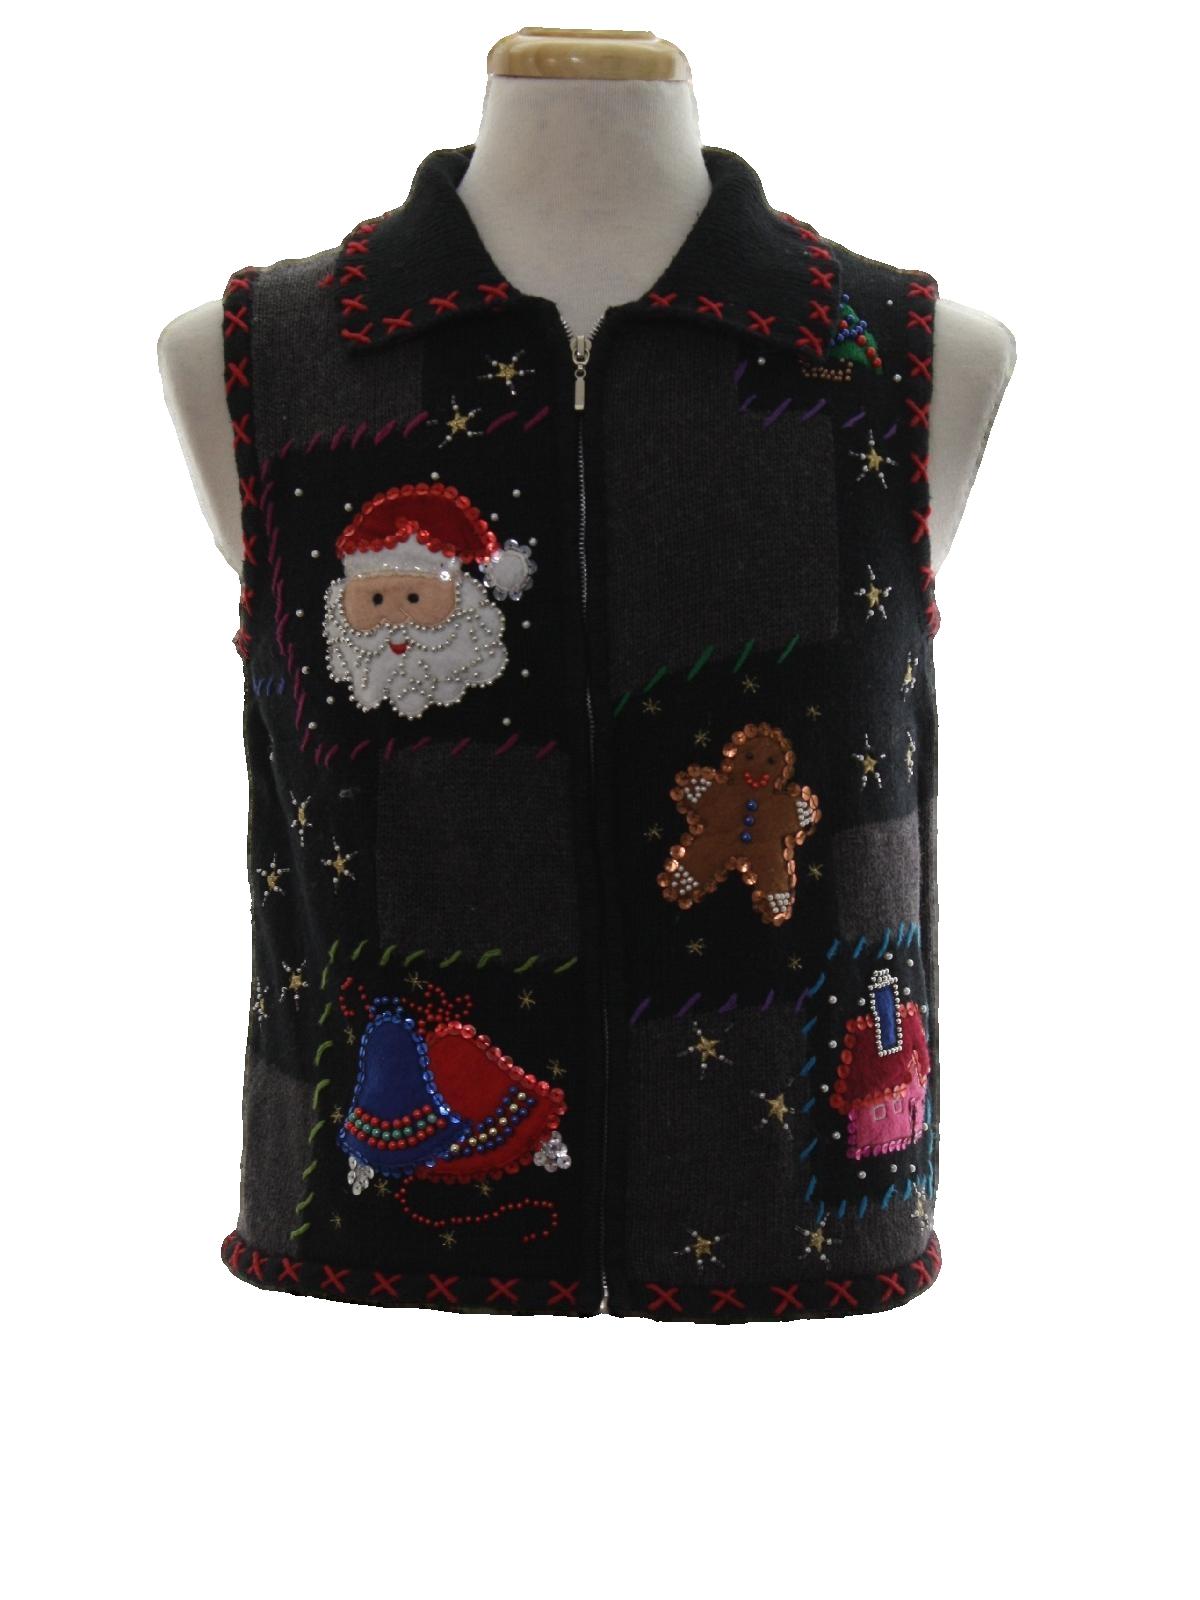 Womens Ugly Christmas Sweater Vest: -Rebecca Malone- Petite Womens